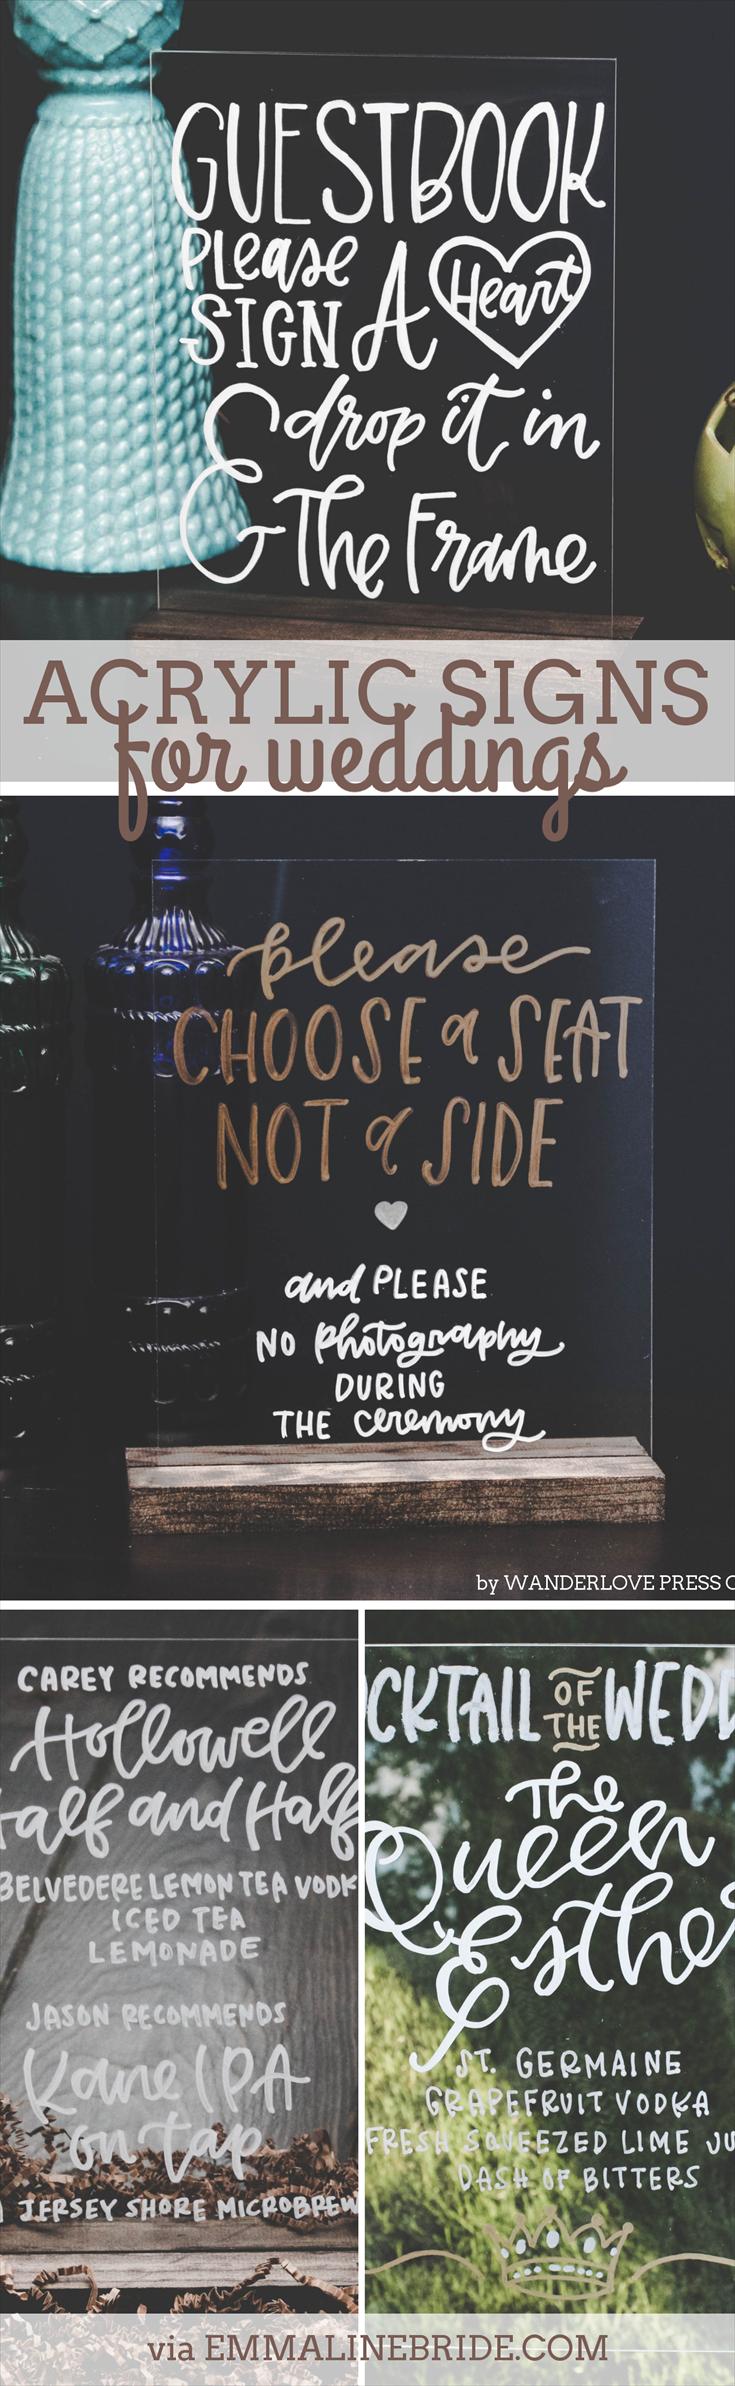 Acrylic Signs for Weddings